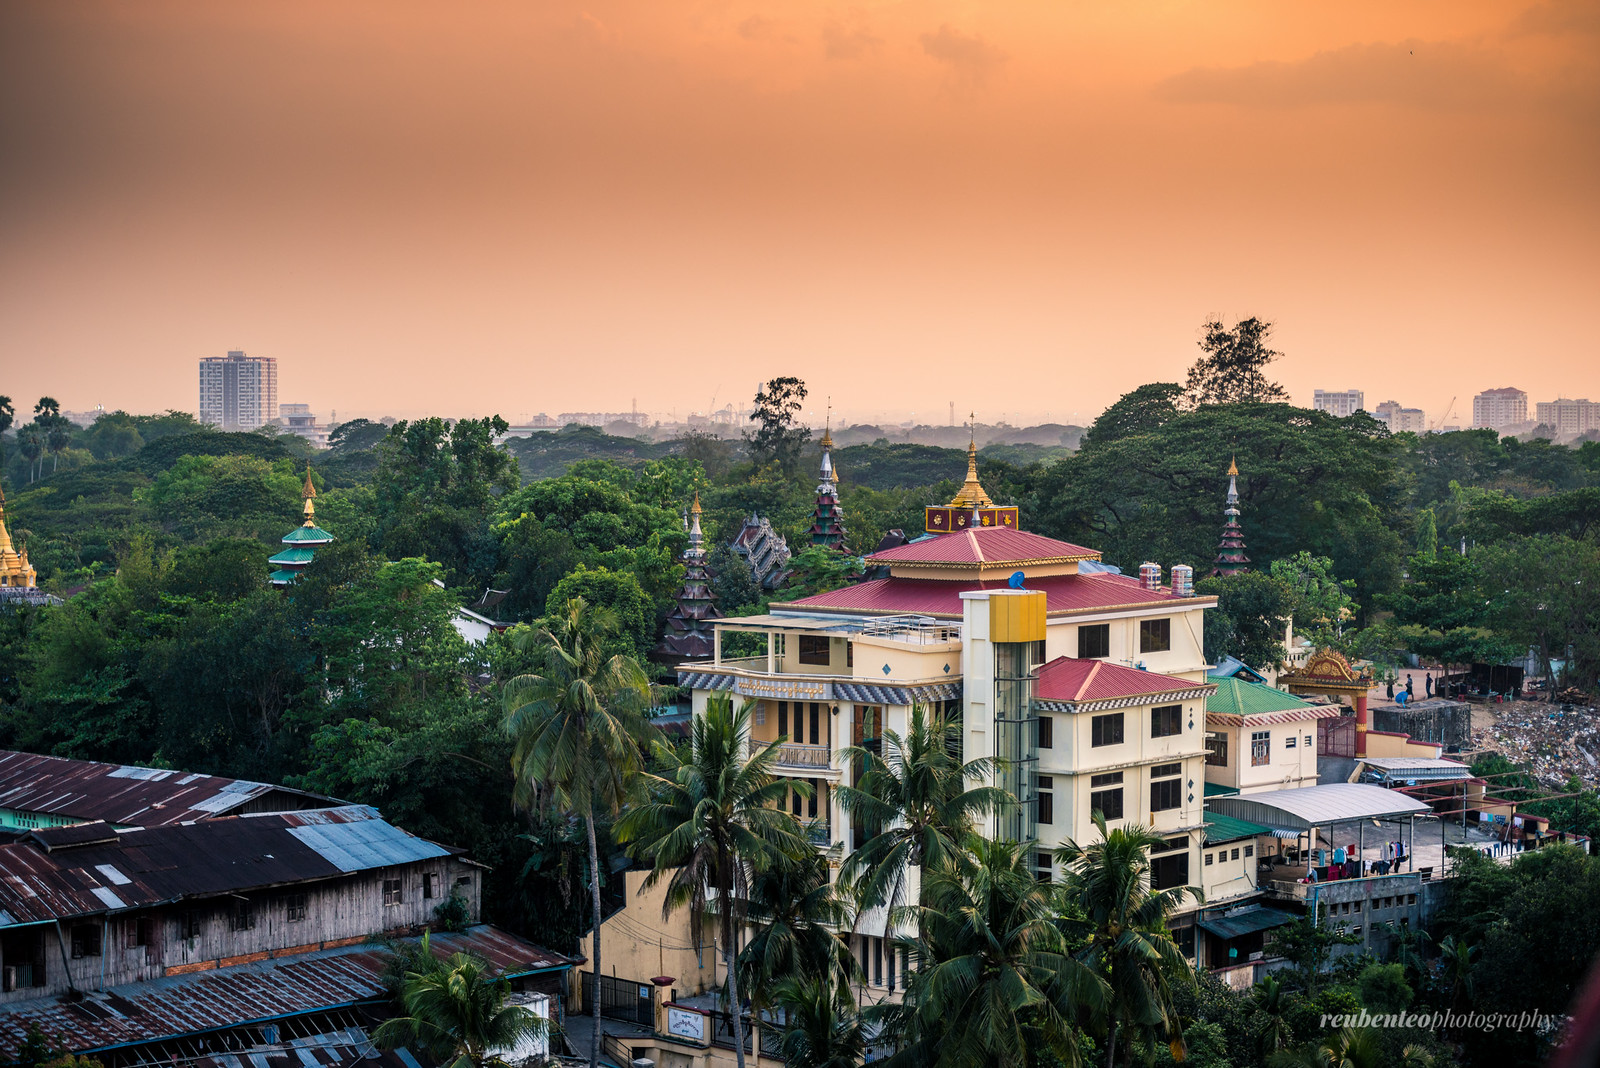 Yangon at Sunset